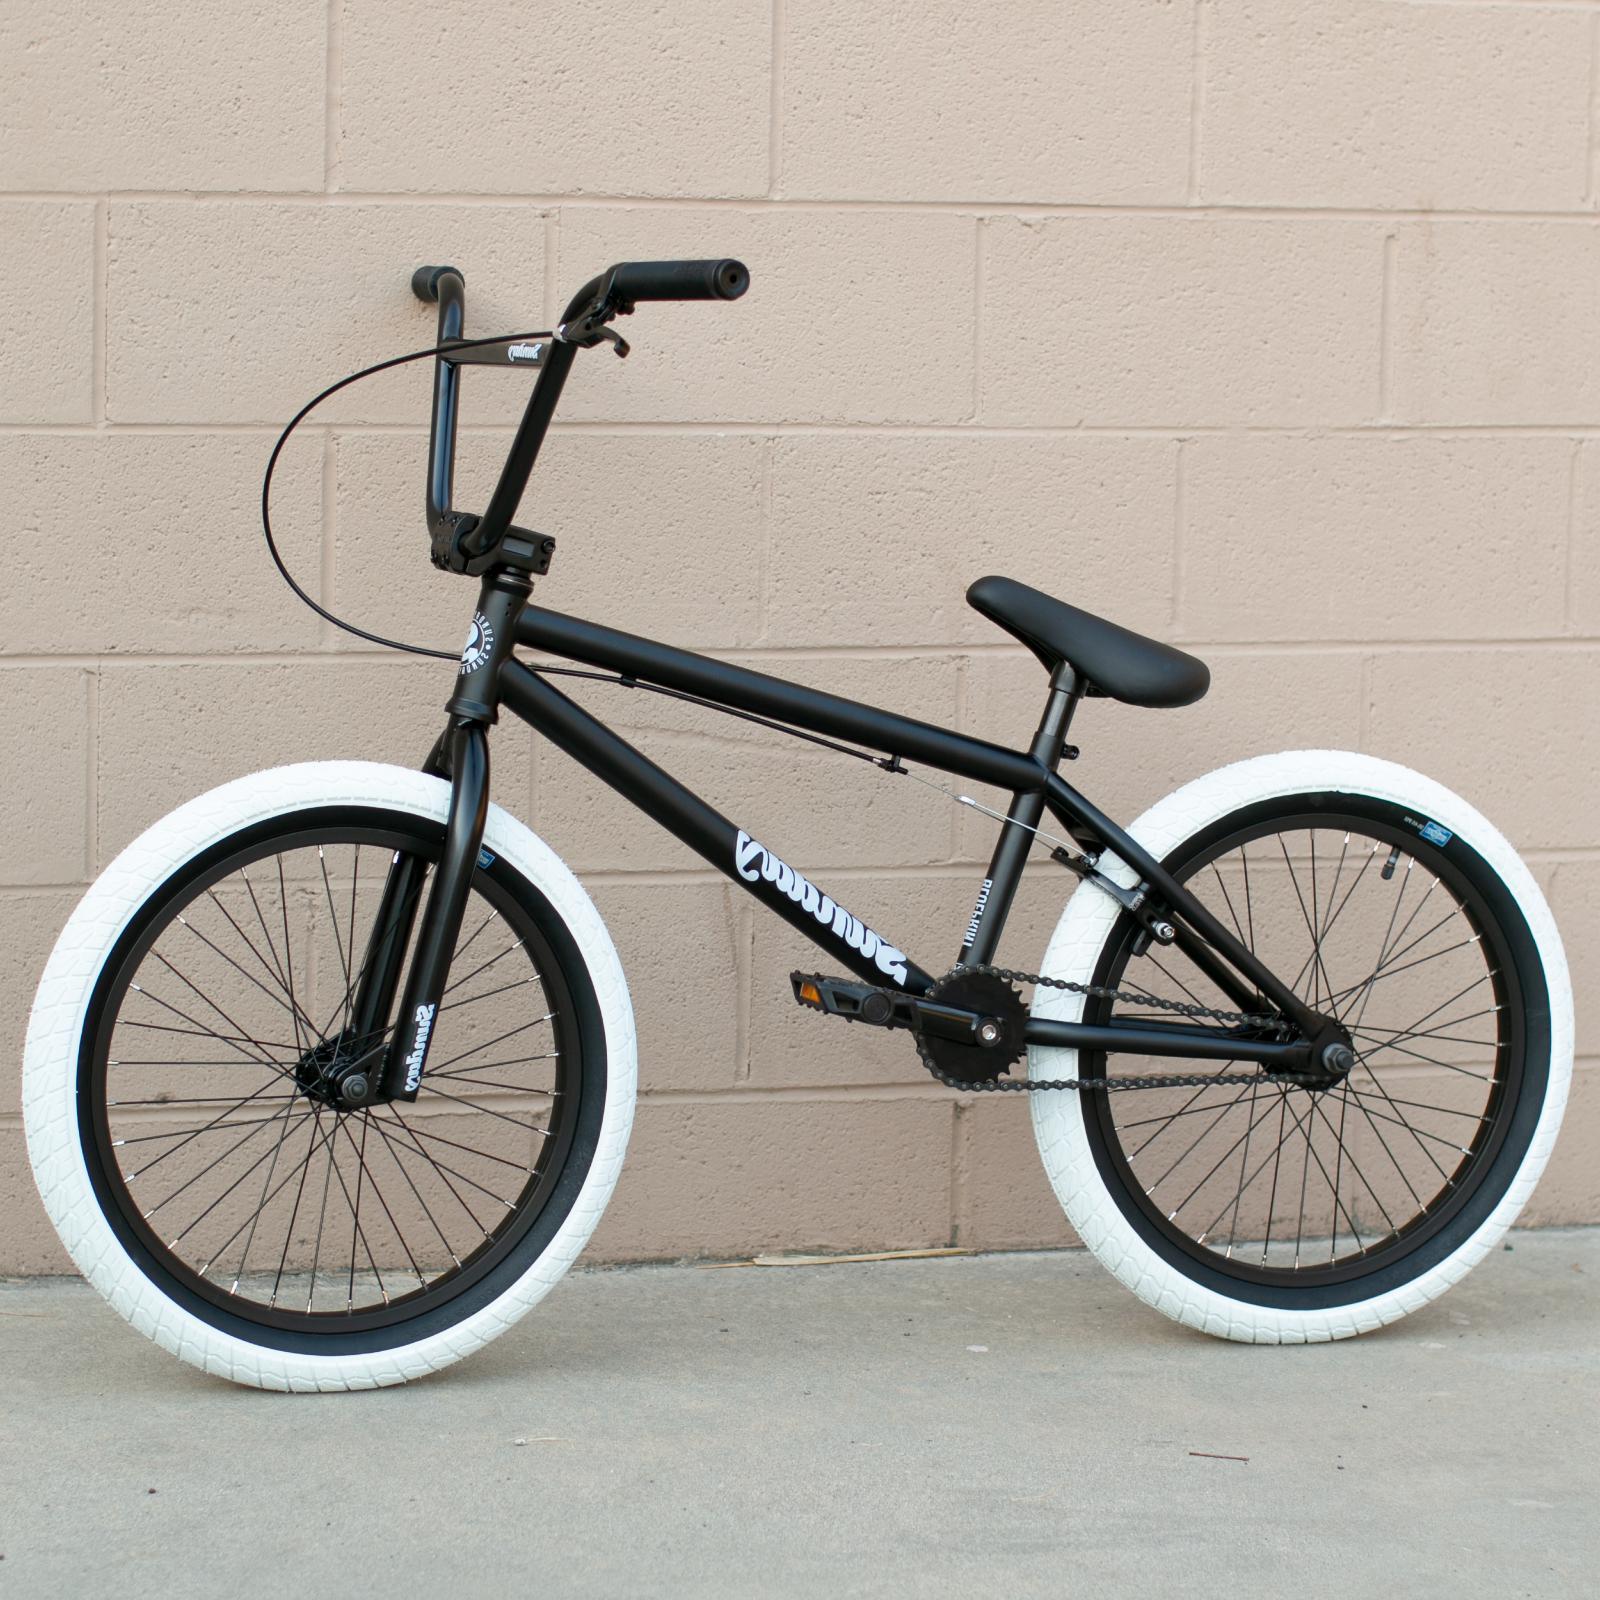 2020 bike bmx blueprint 20 bicycle black